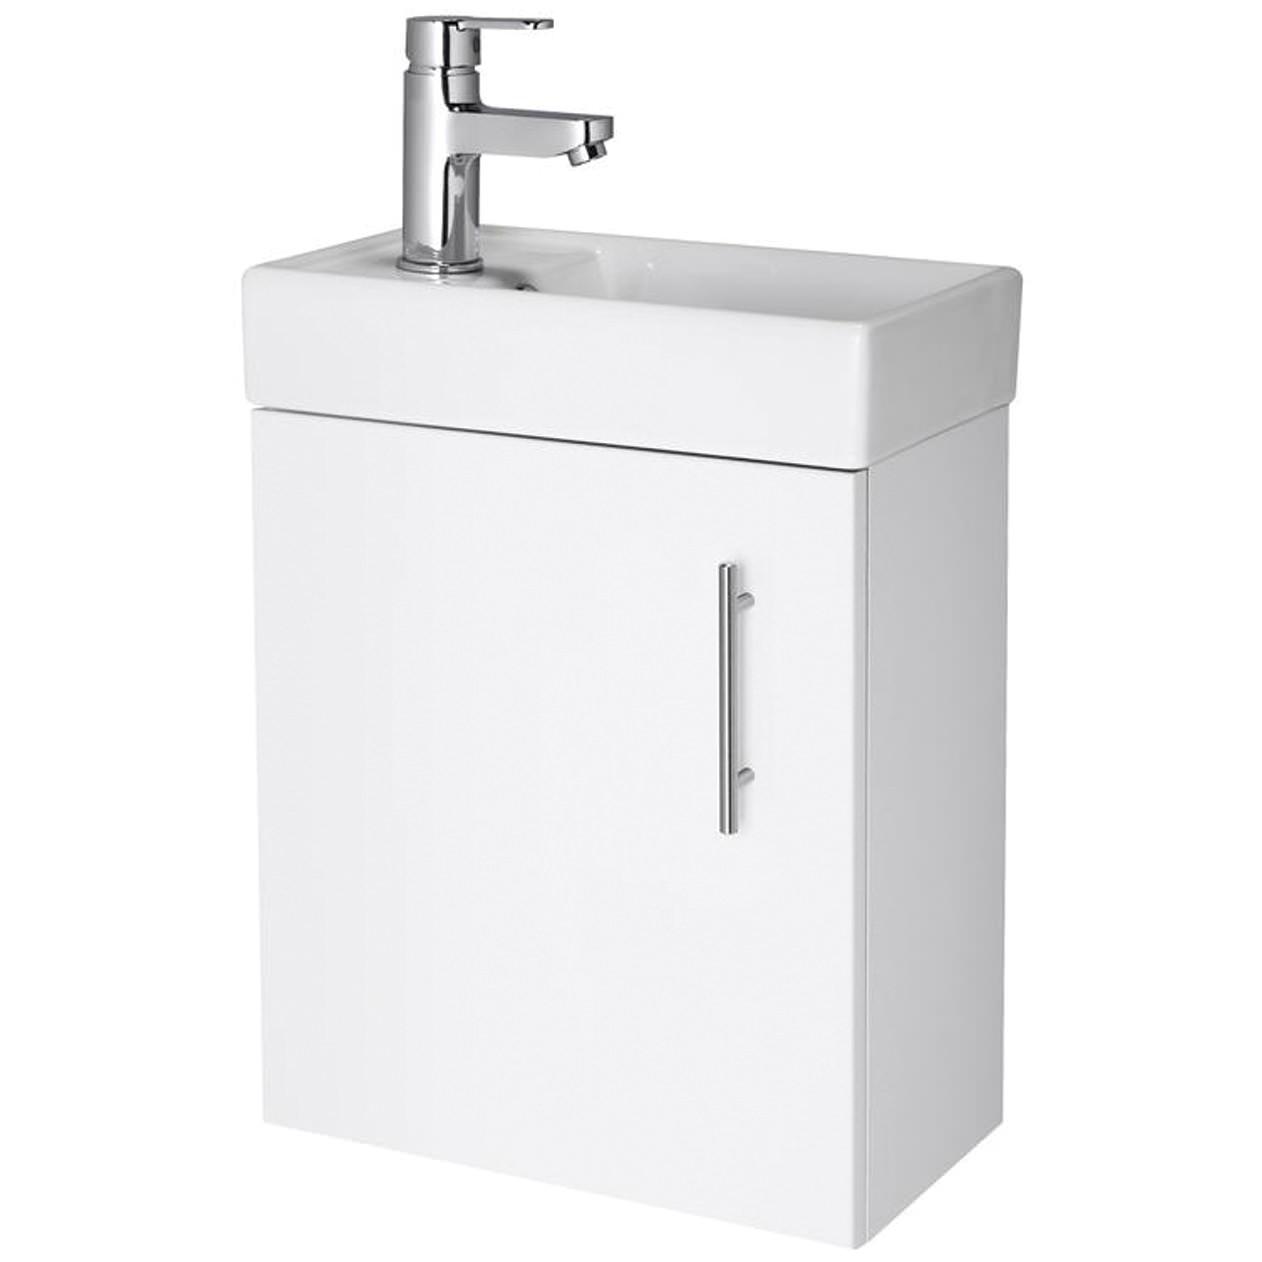 Minimalist gloss white vanity unit 600 800 or 1000mm - More Info Lauren Nvx182